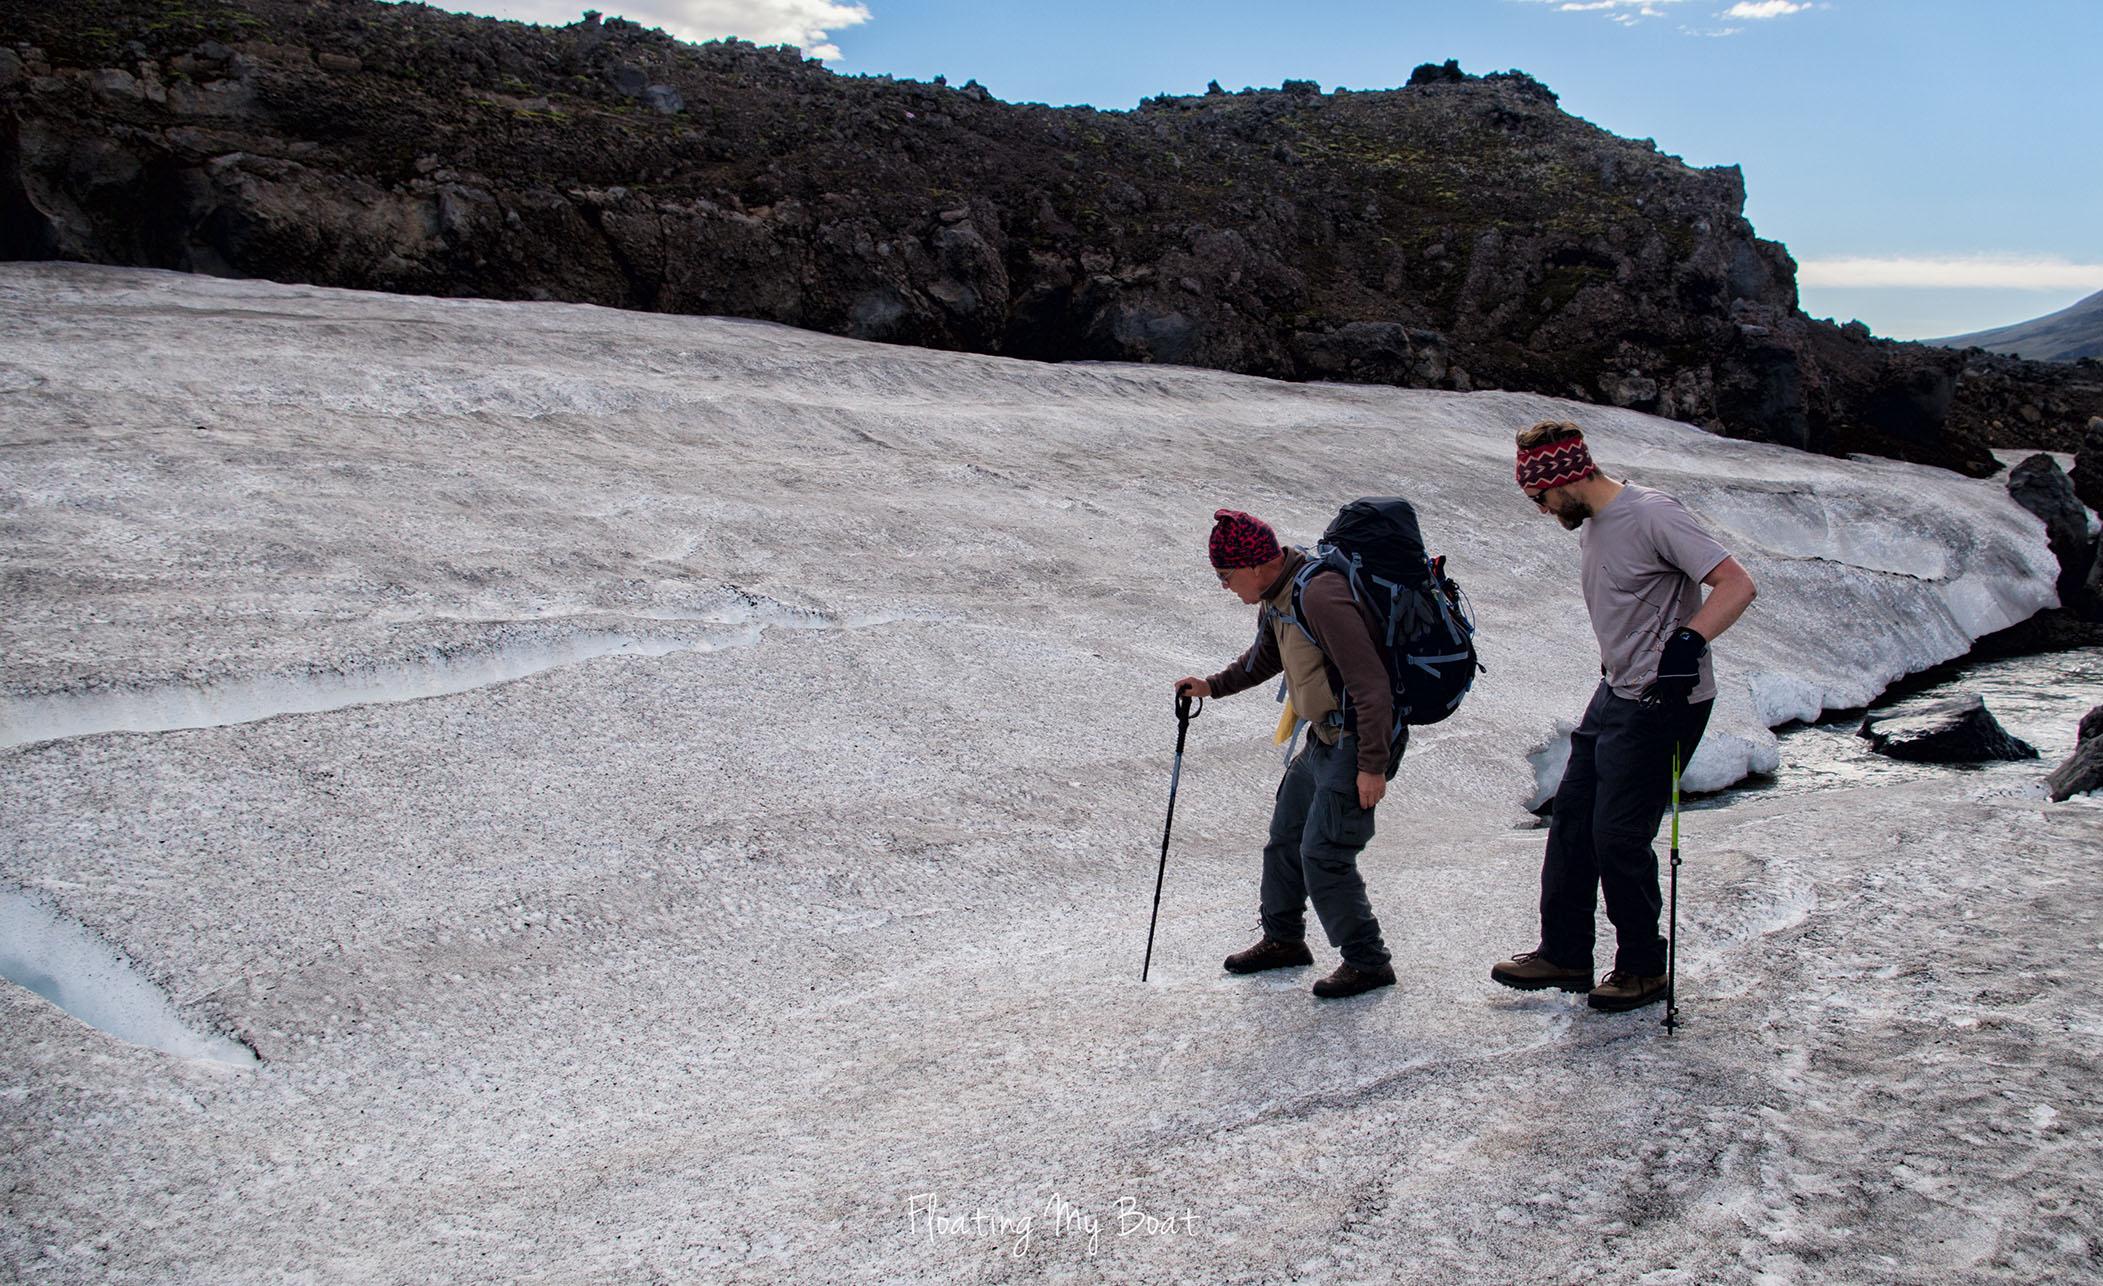 trekking-iceland-vatnajokull-national-park-32